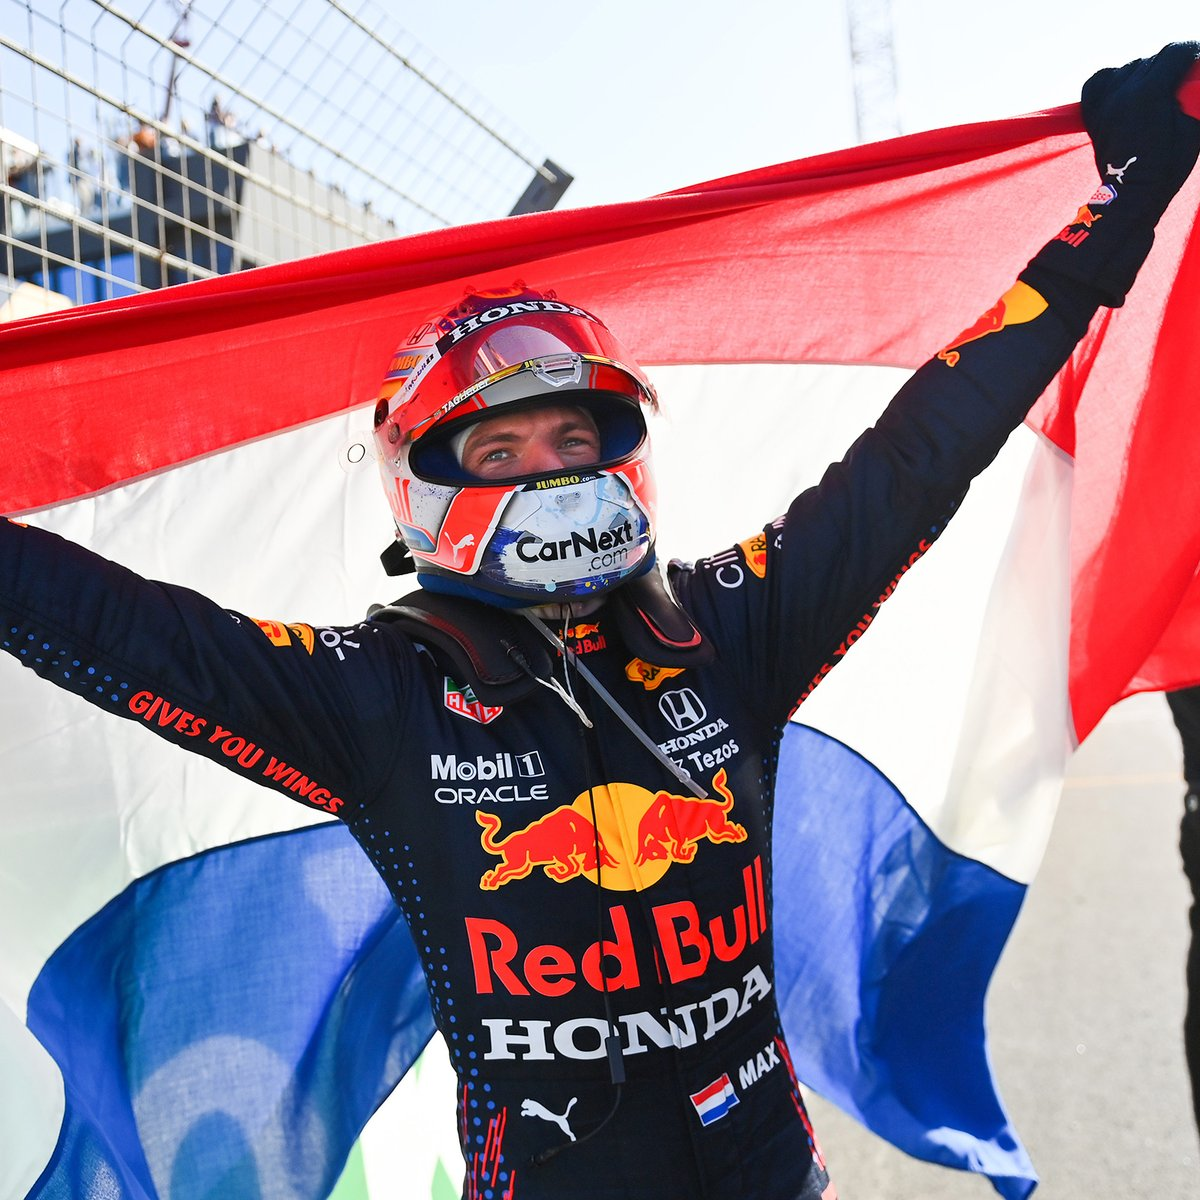 Max Verstappen Wins Lewis Hamilton Top spot in Mercedes Star Bemoans Team Tactics!